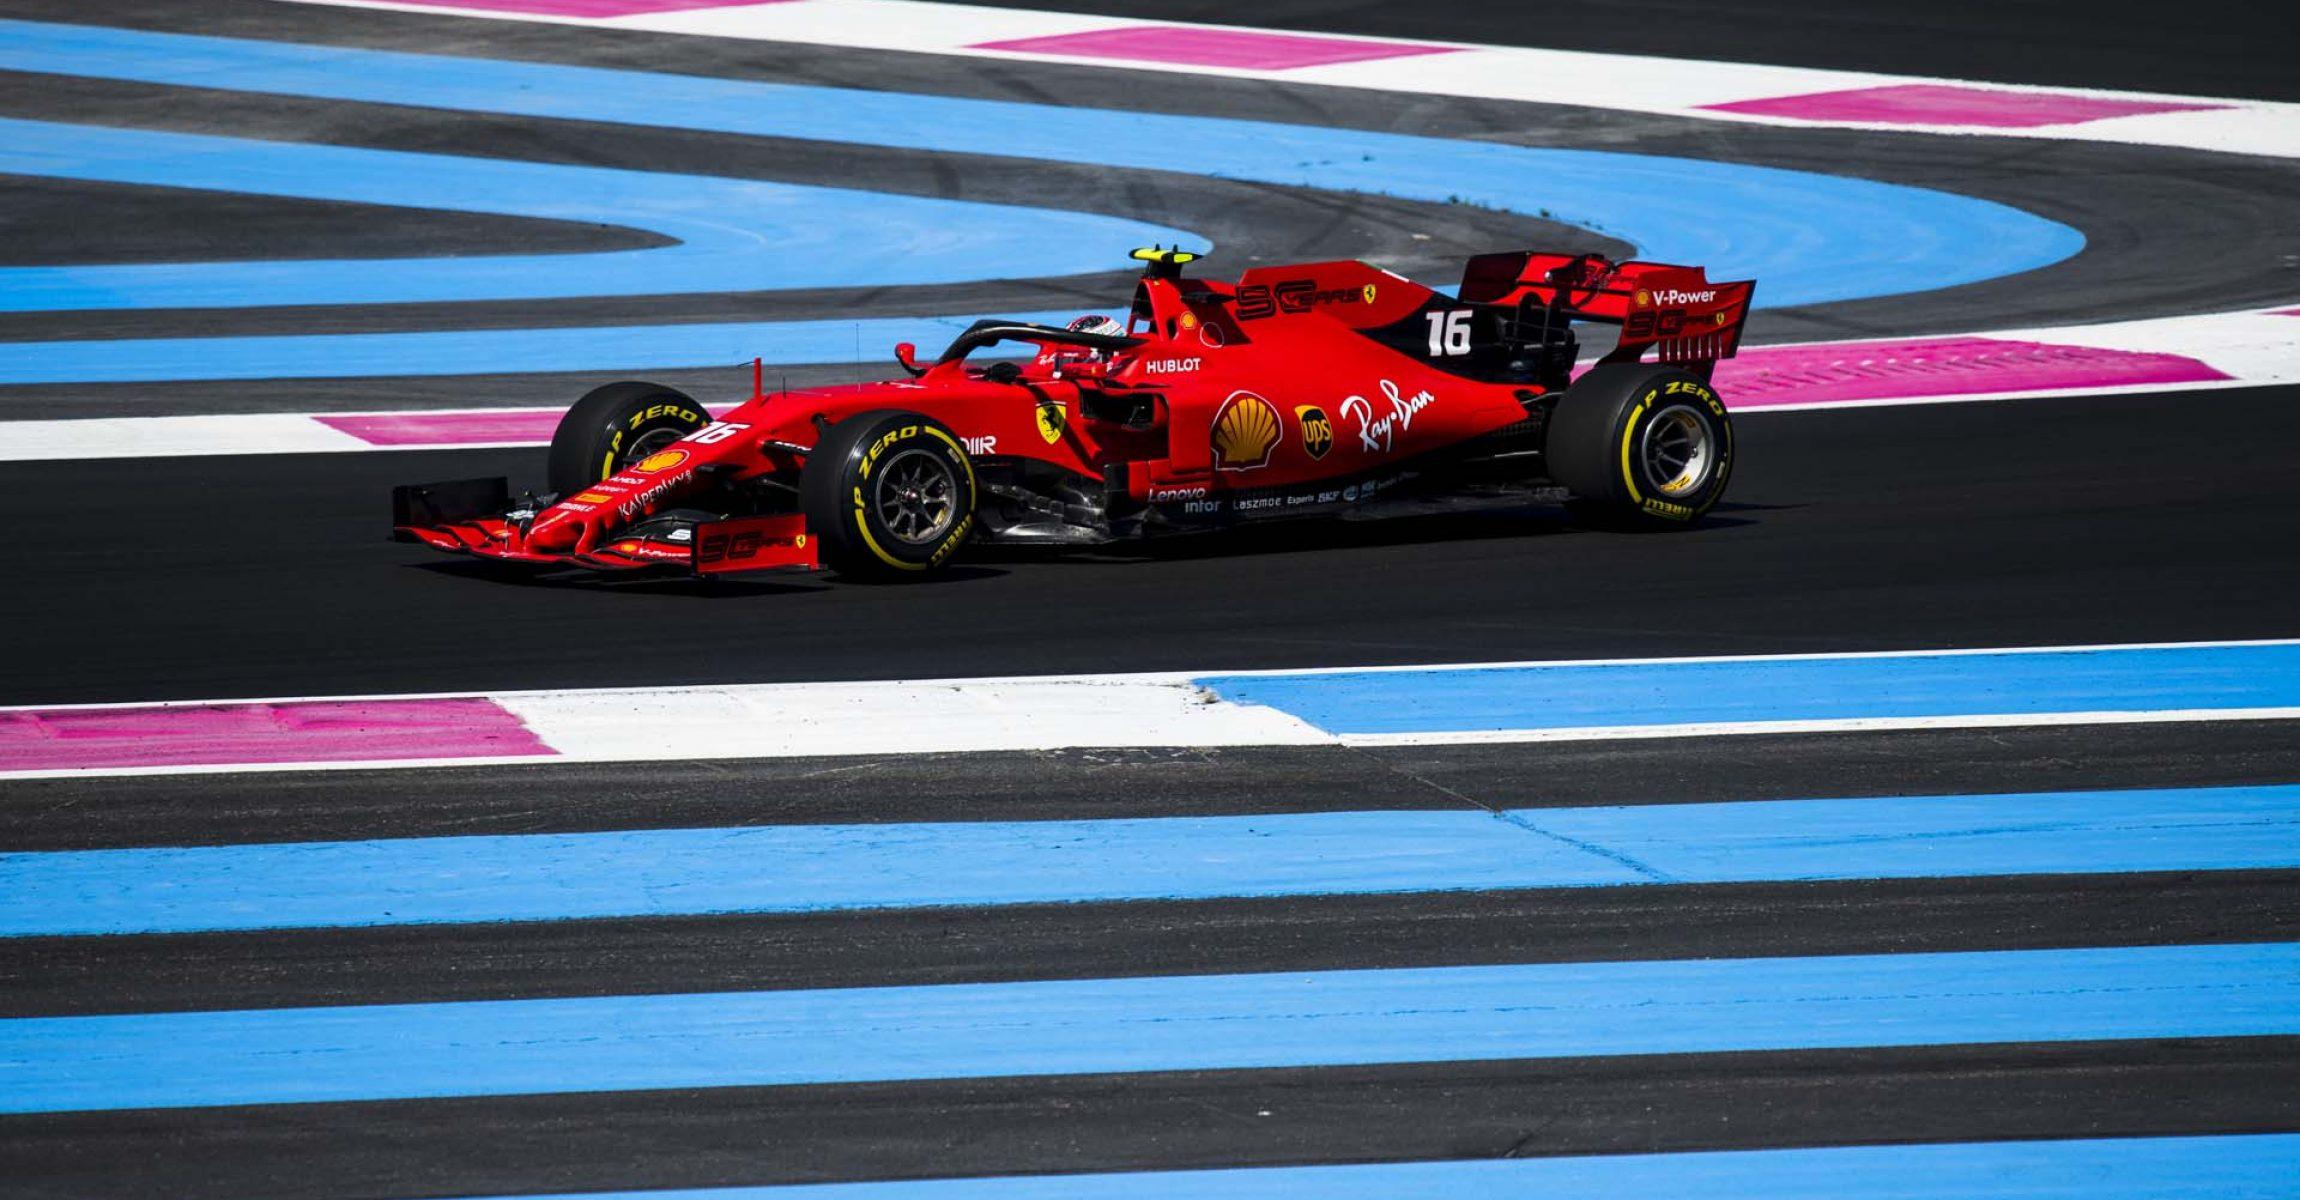 Charles Leclerc, Ferrari, French GP Le Castellet, Paul Ricard